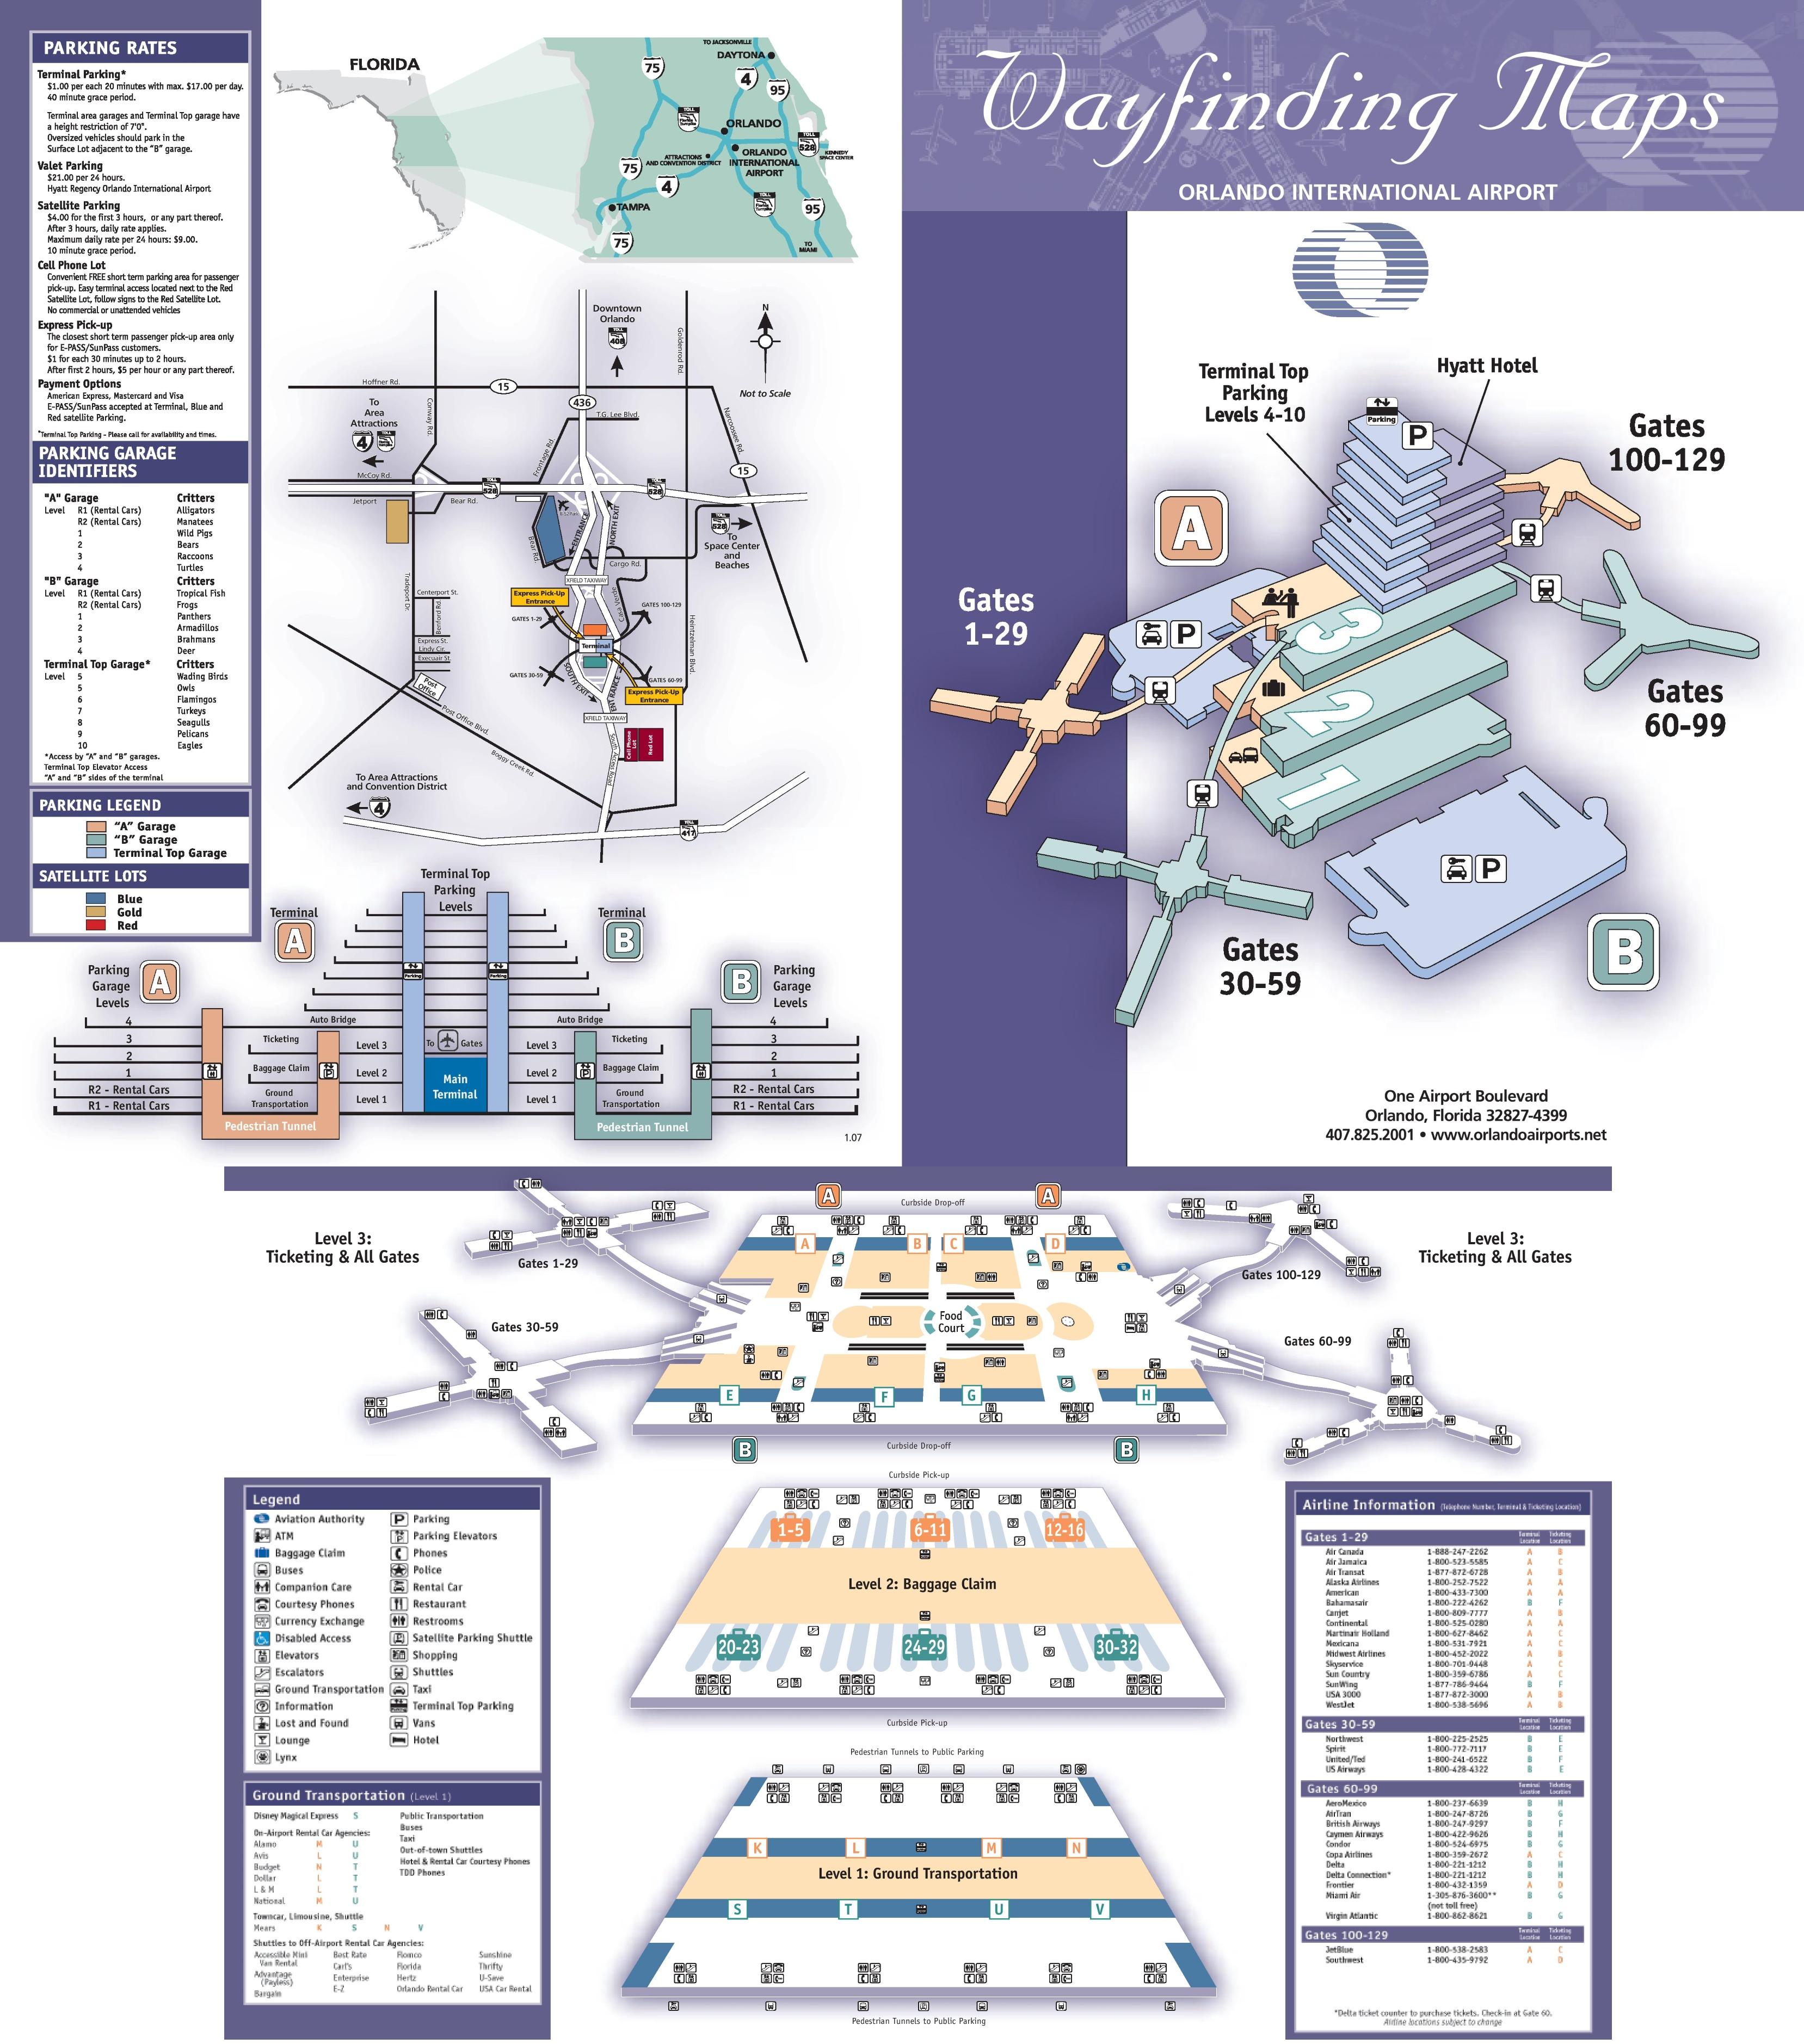 Orlando Airport Map Orlando International Airport map Orlando Airport Map